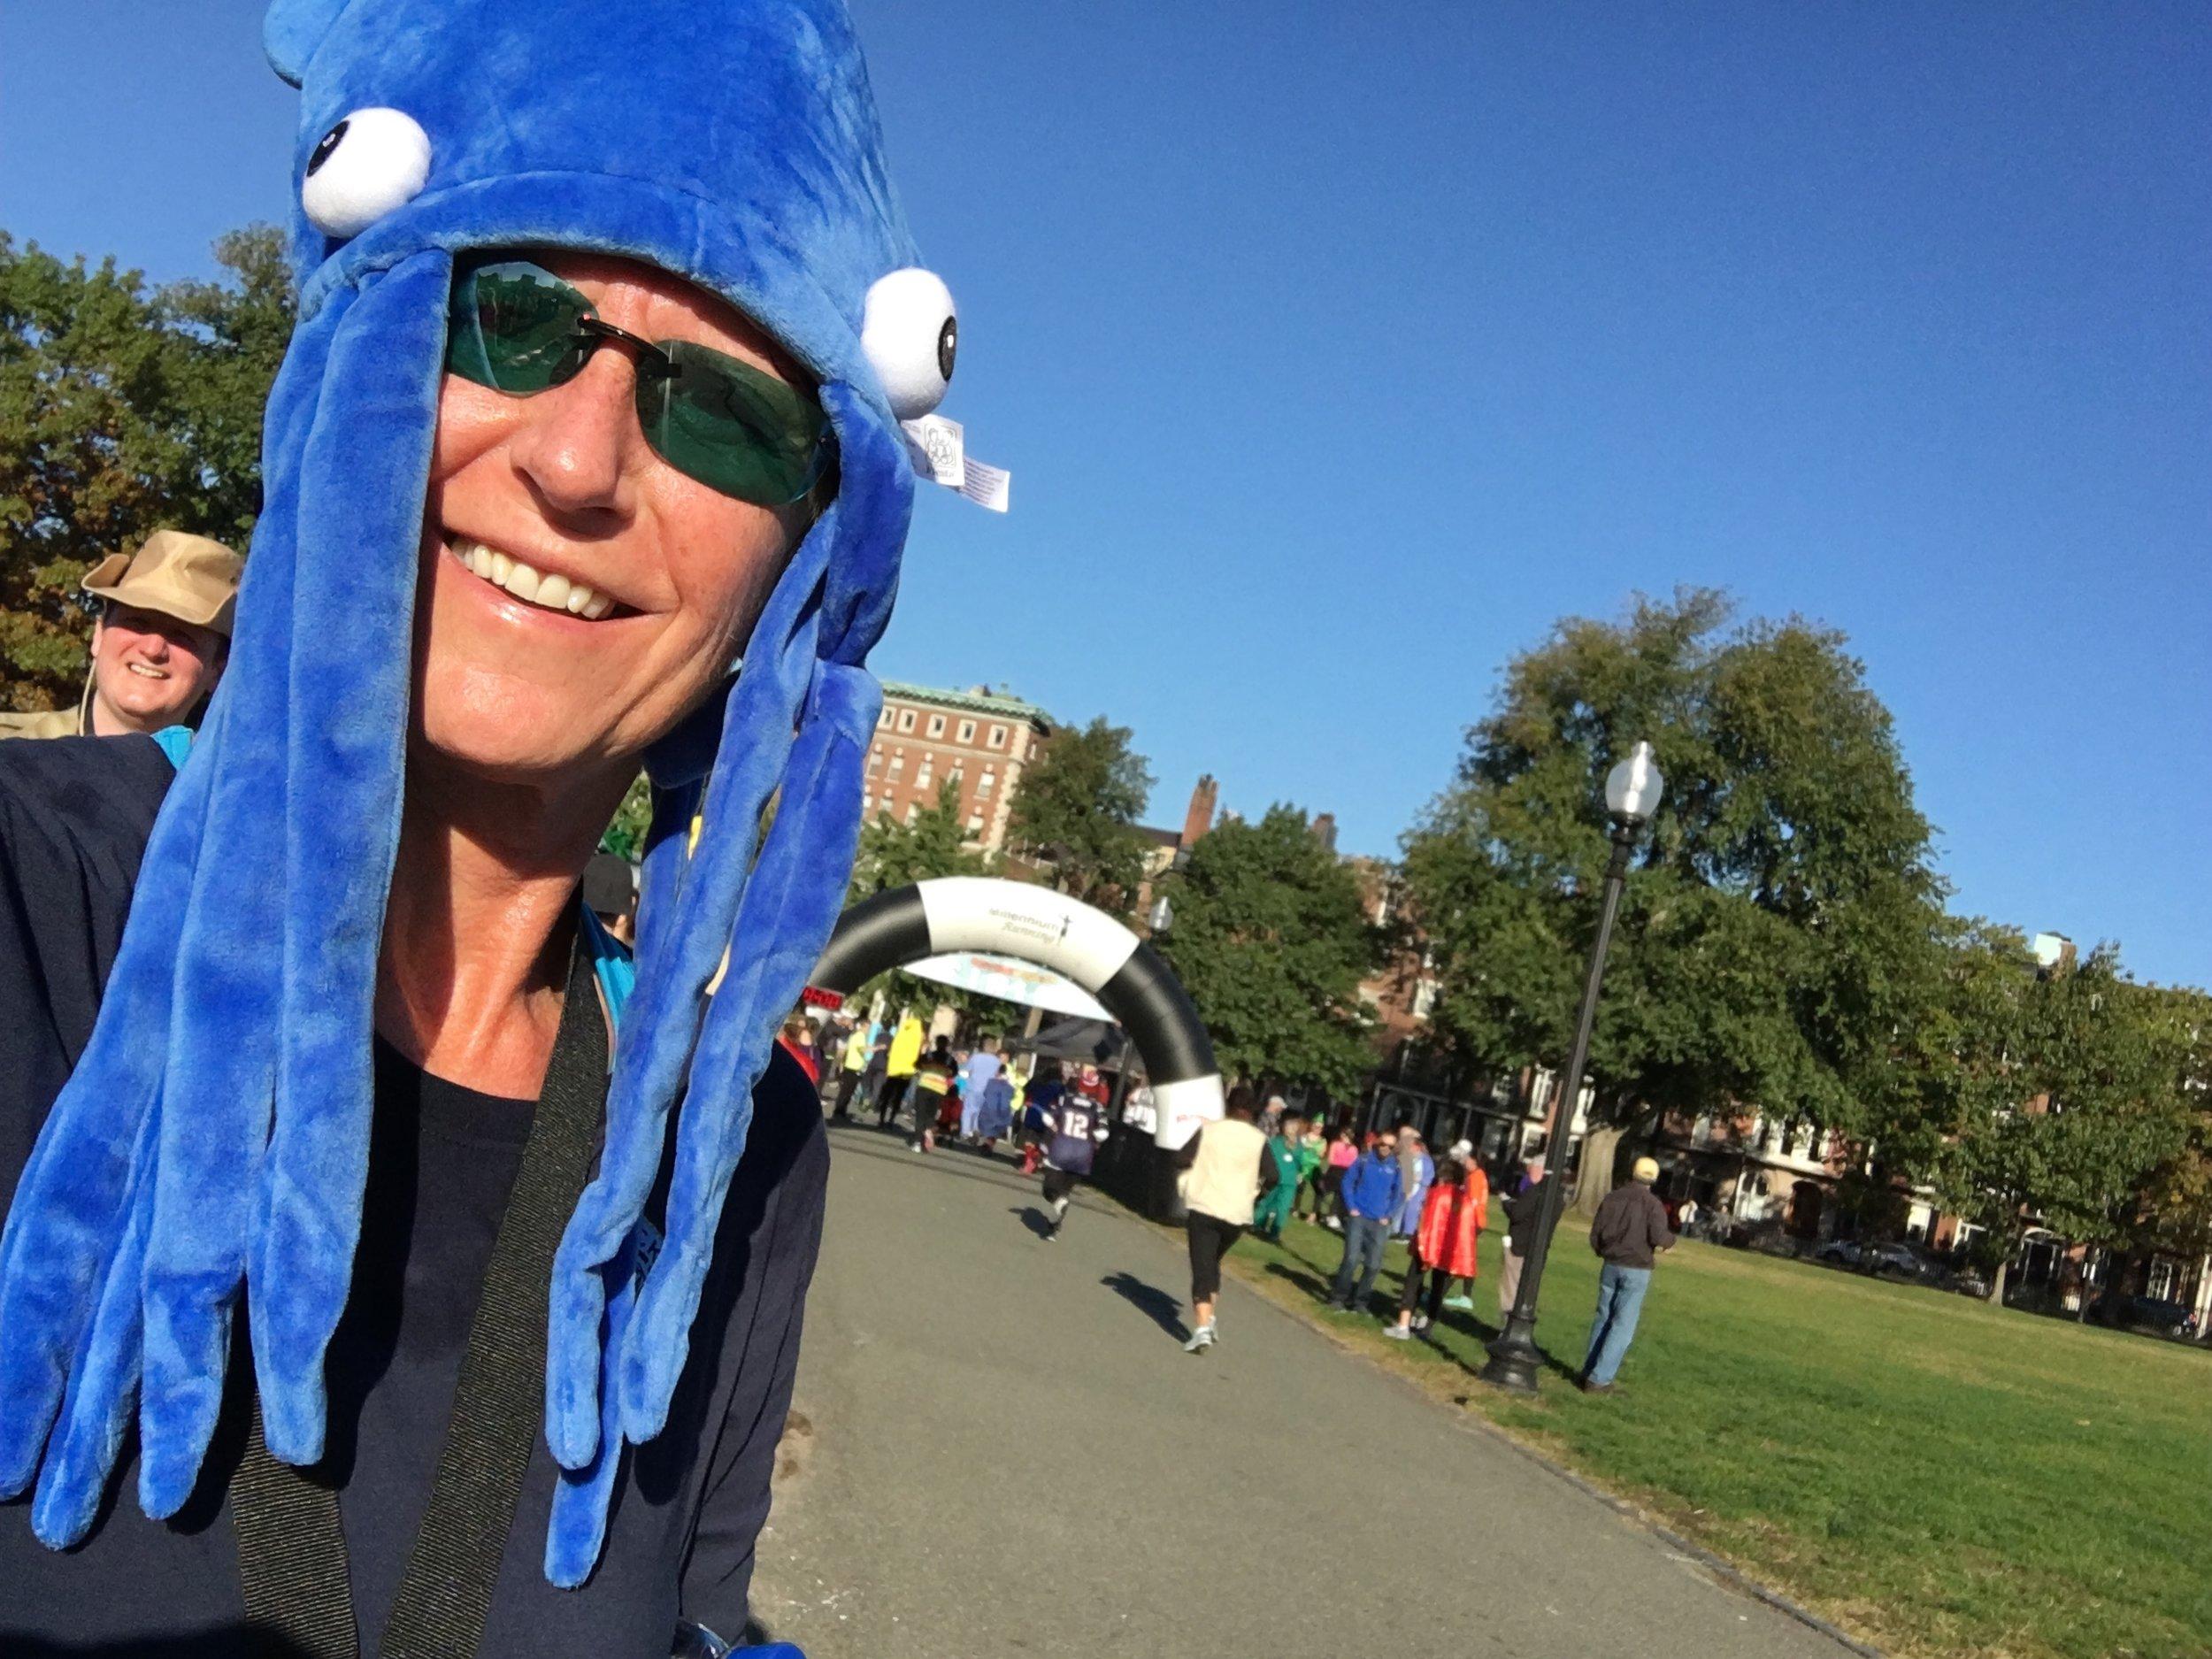 DARCIE EVANS - At A Halloween Costume 5k in Boston